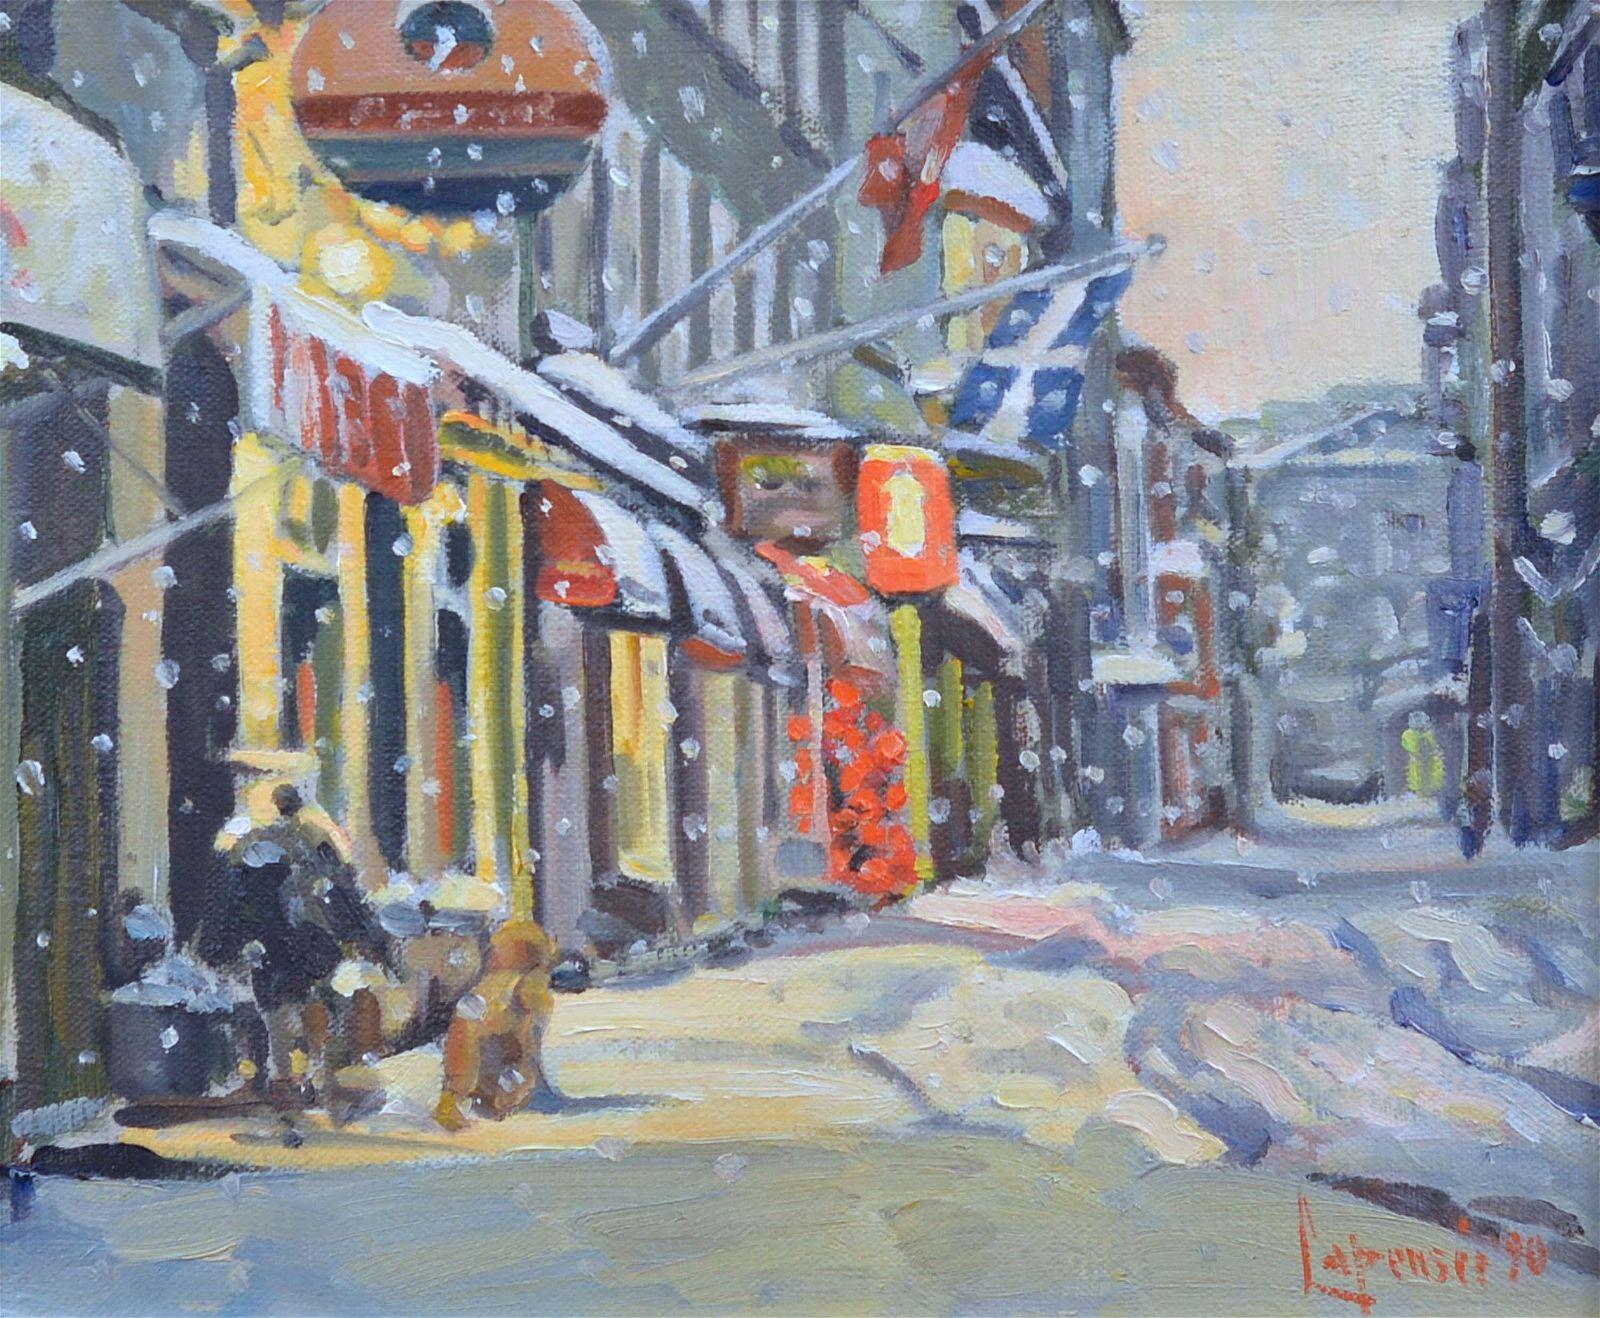 Lapensée, Michel - Rue Buade Québec - 1990